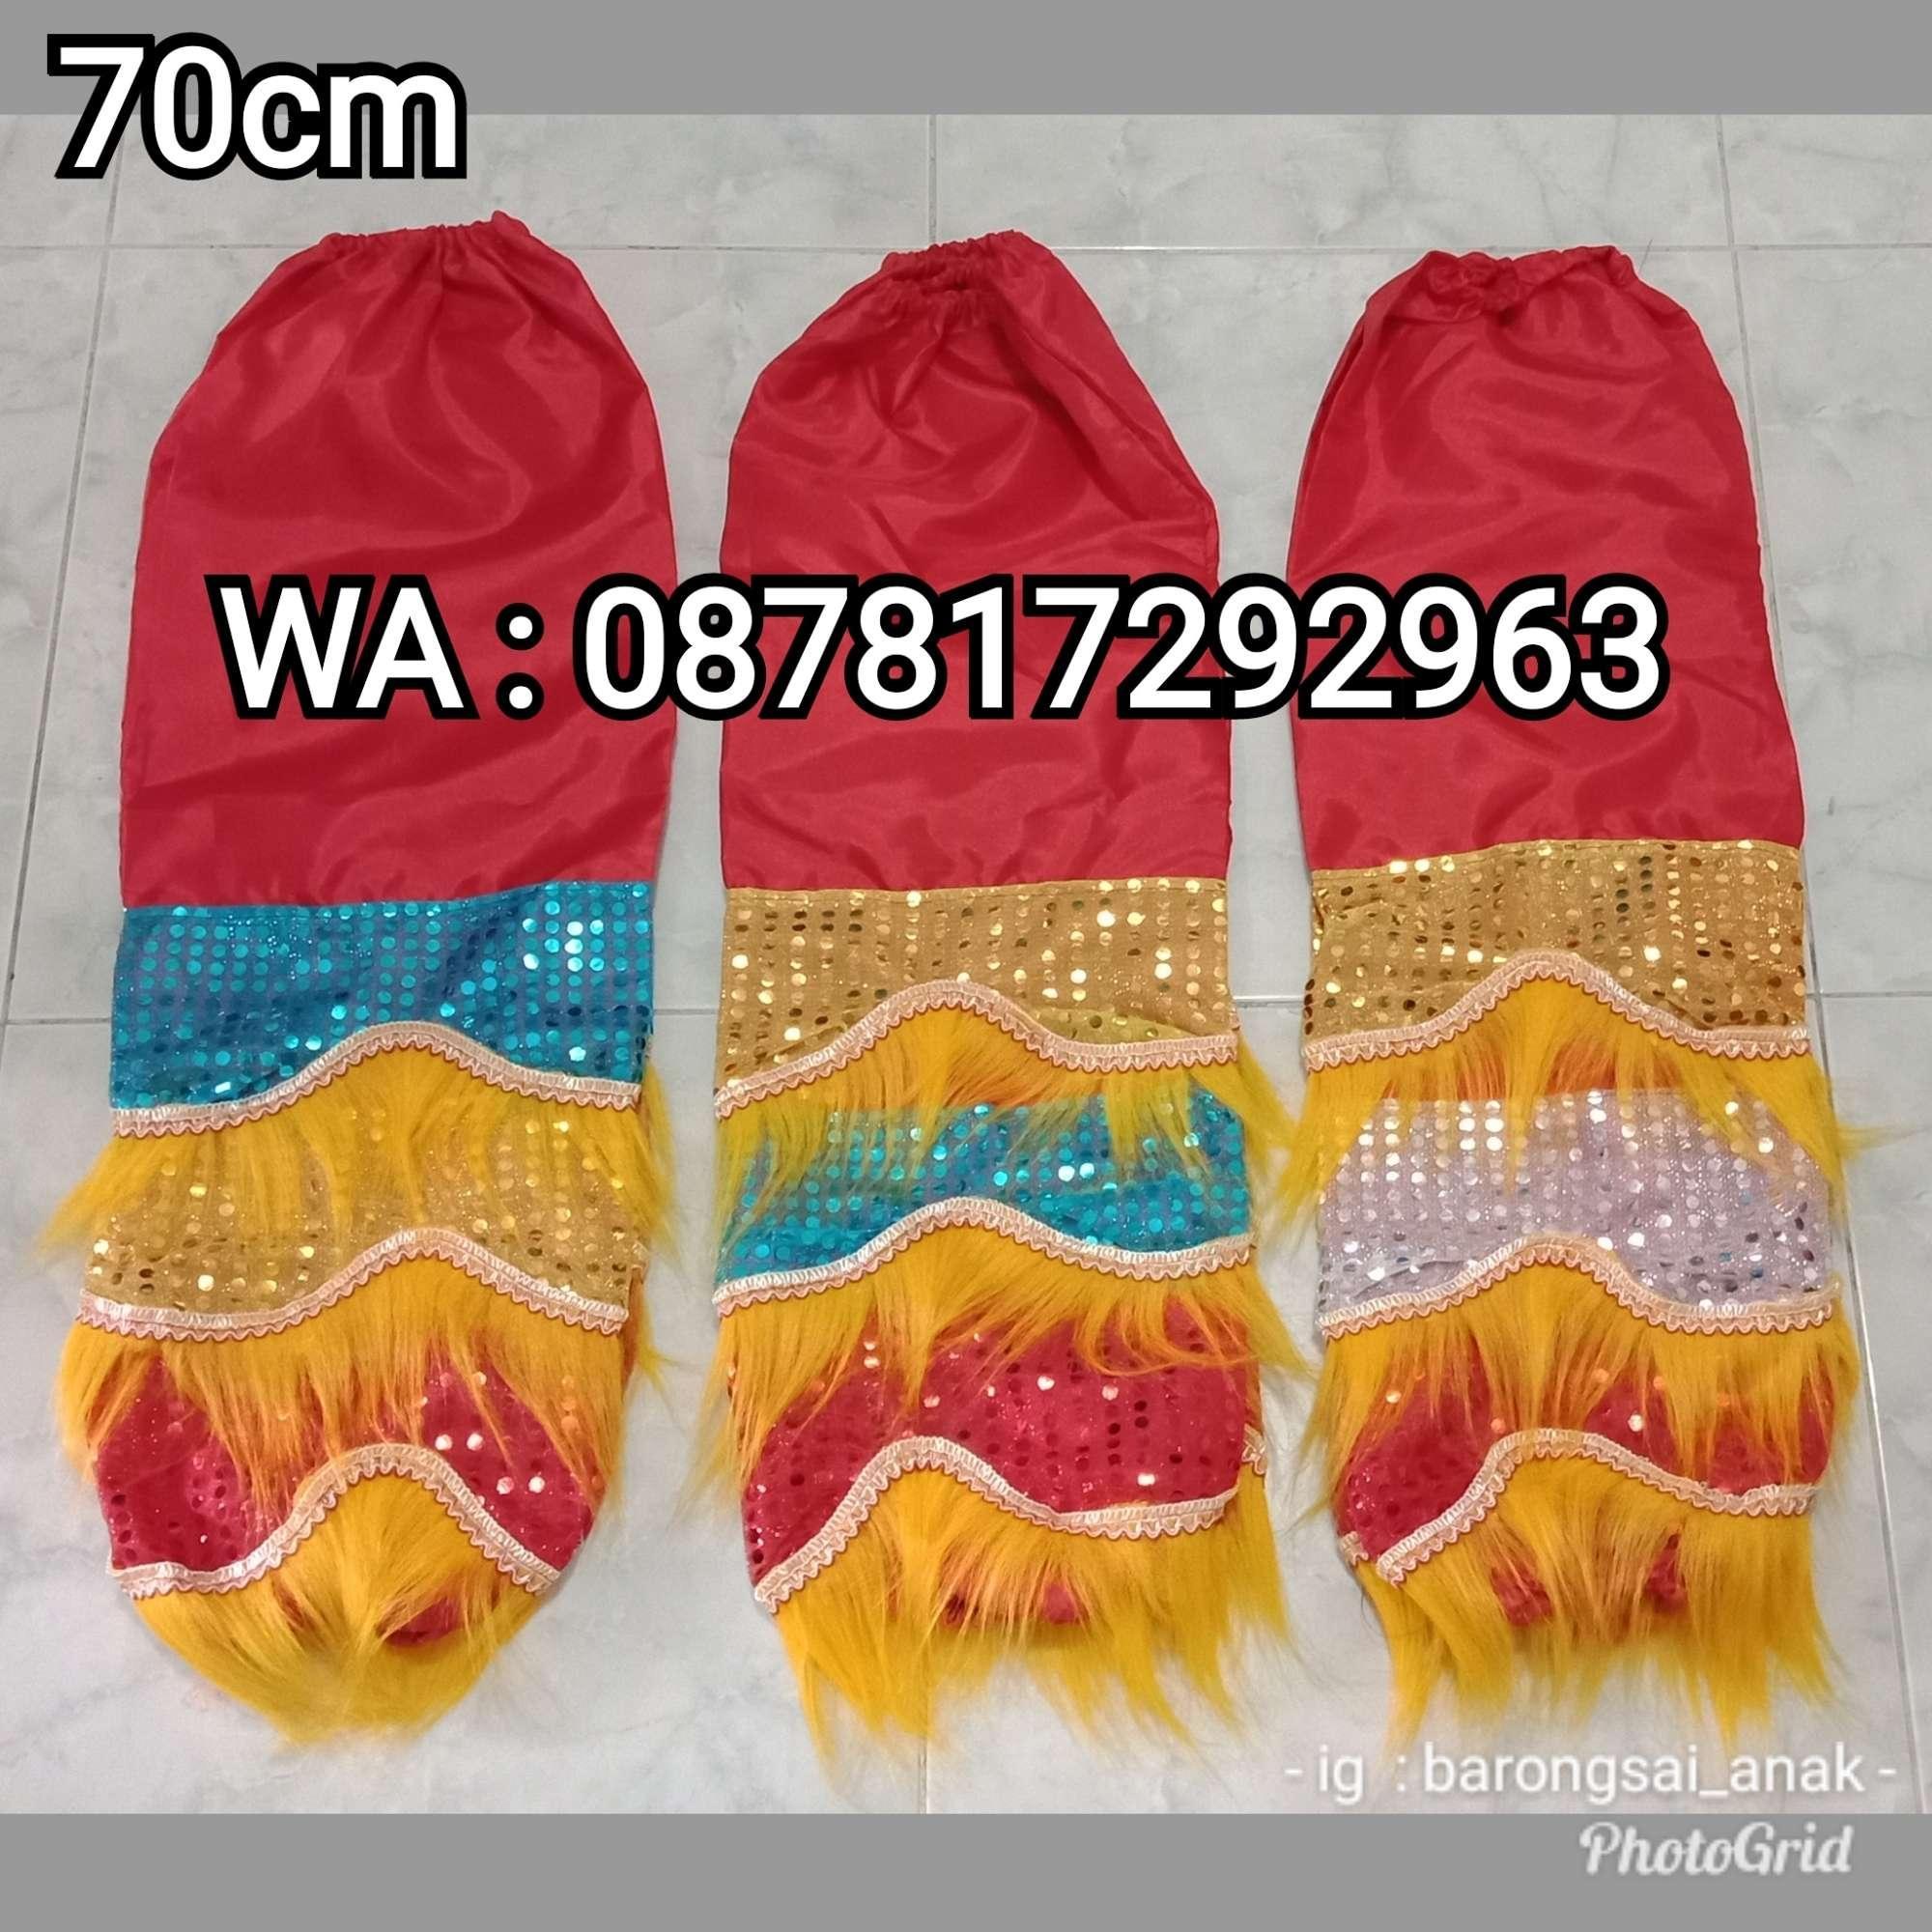 Celana Barongsai Anak bulu Kuning panjang 70cm